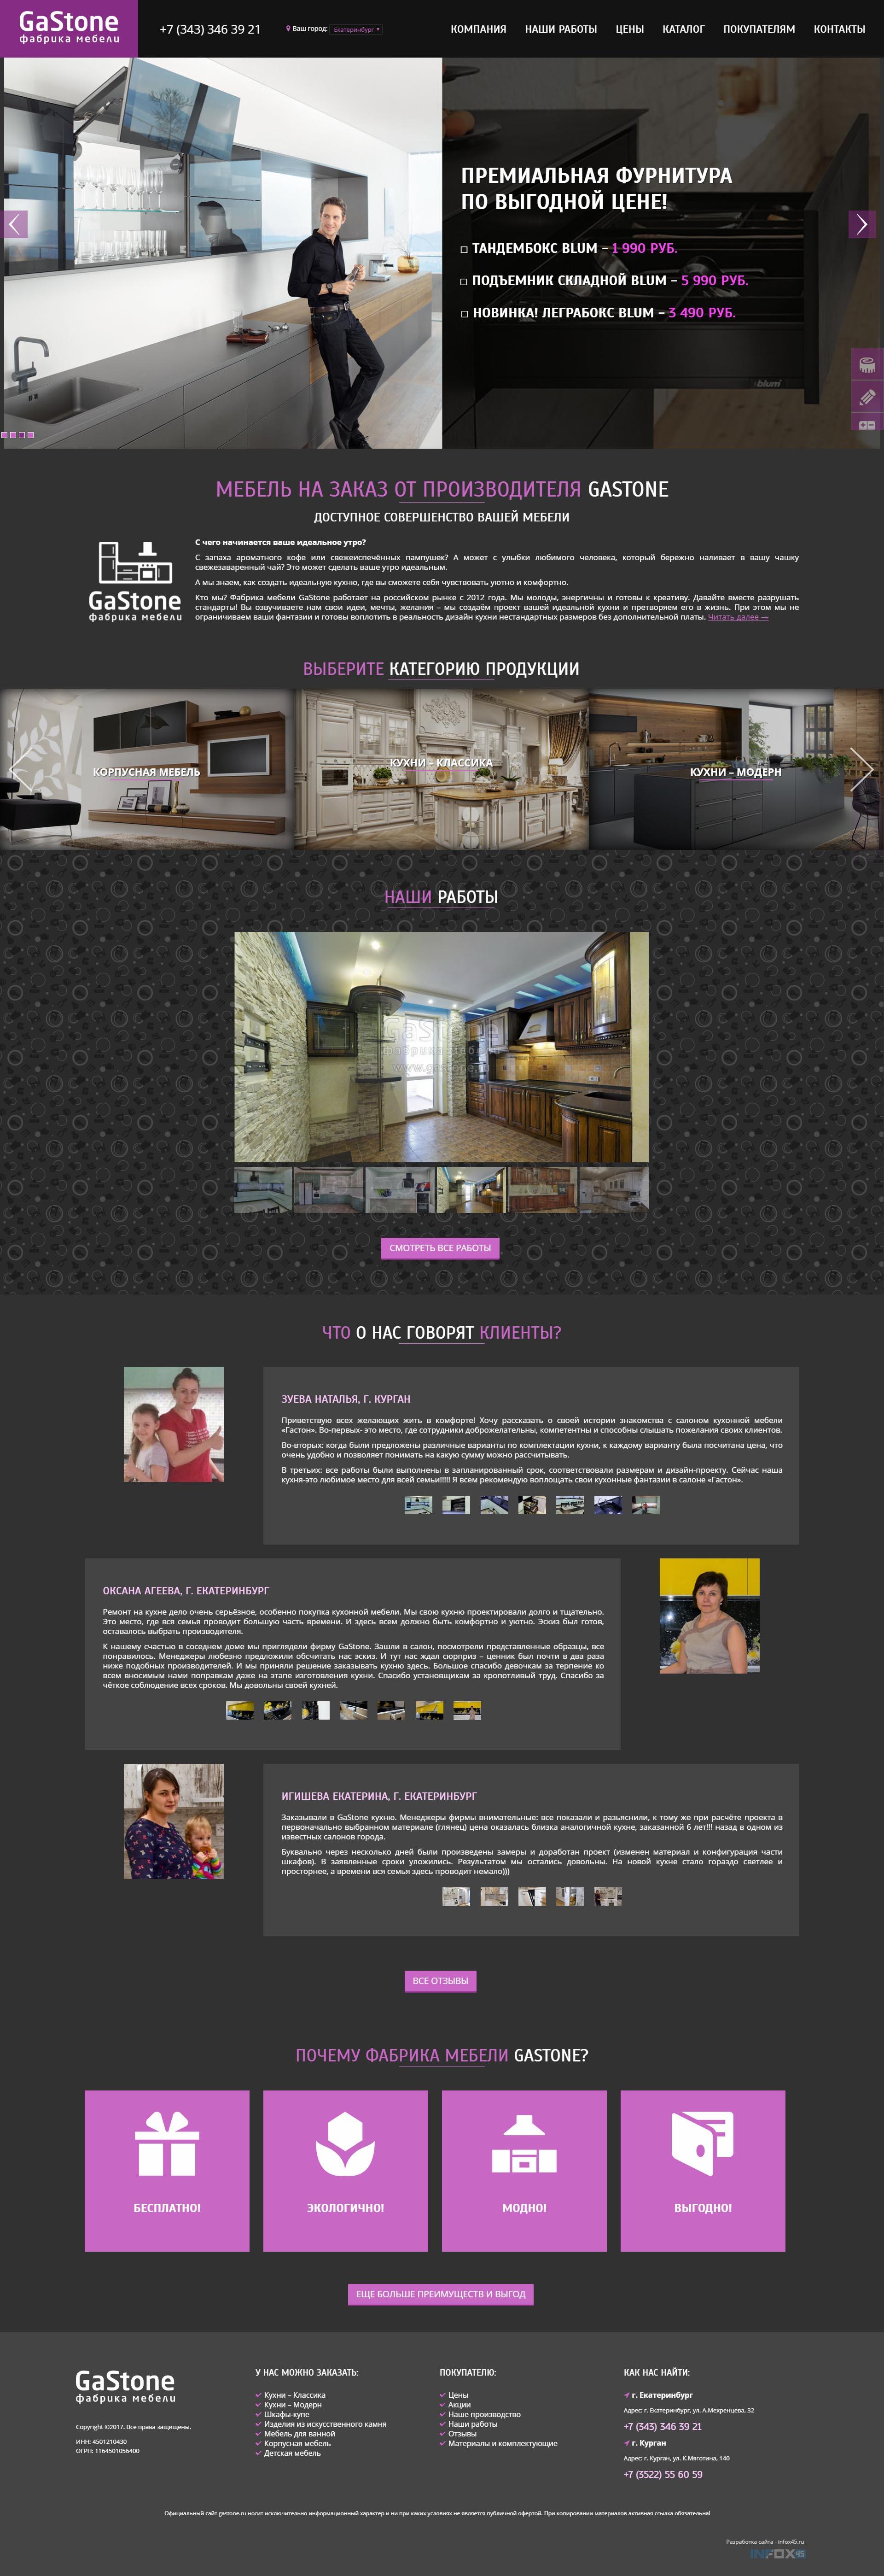 Дизайн сайта фабрики мебели